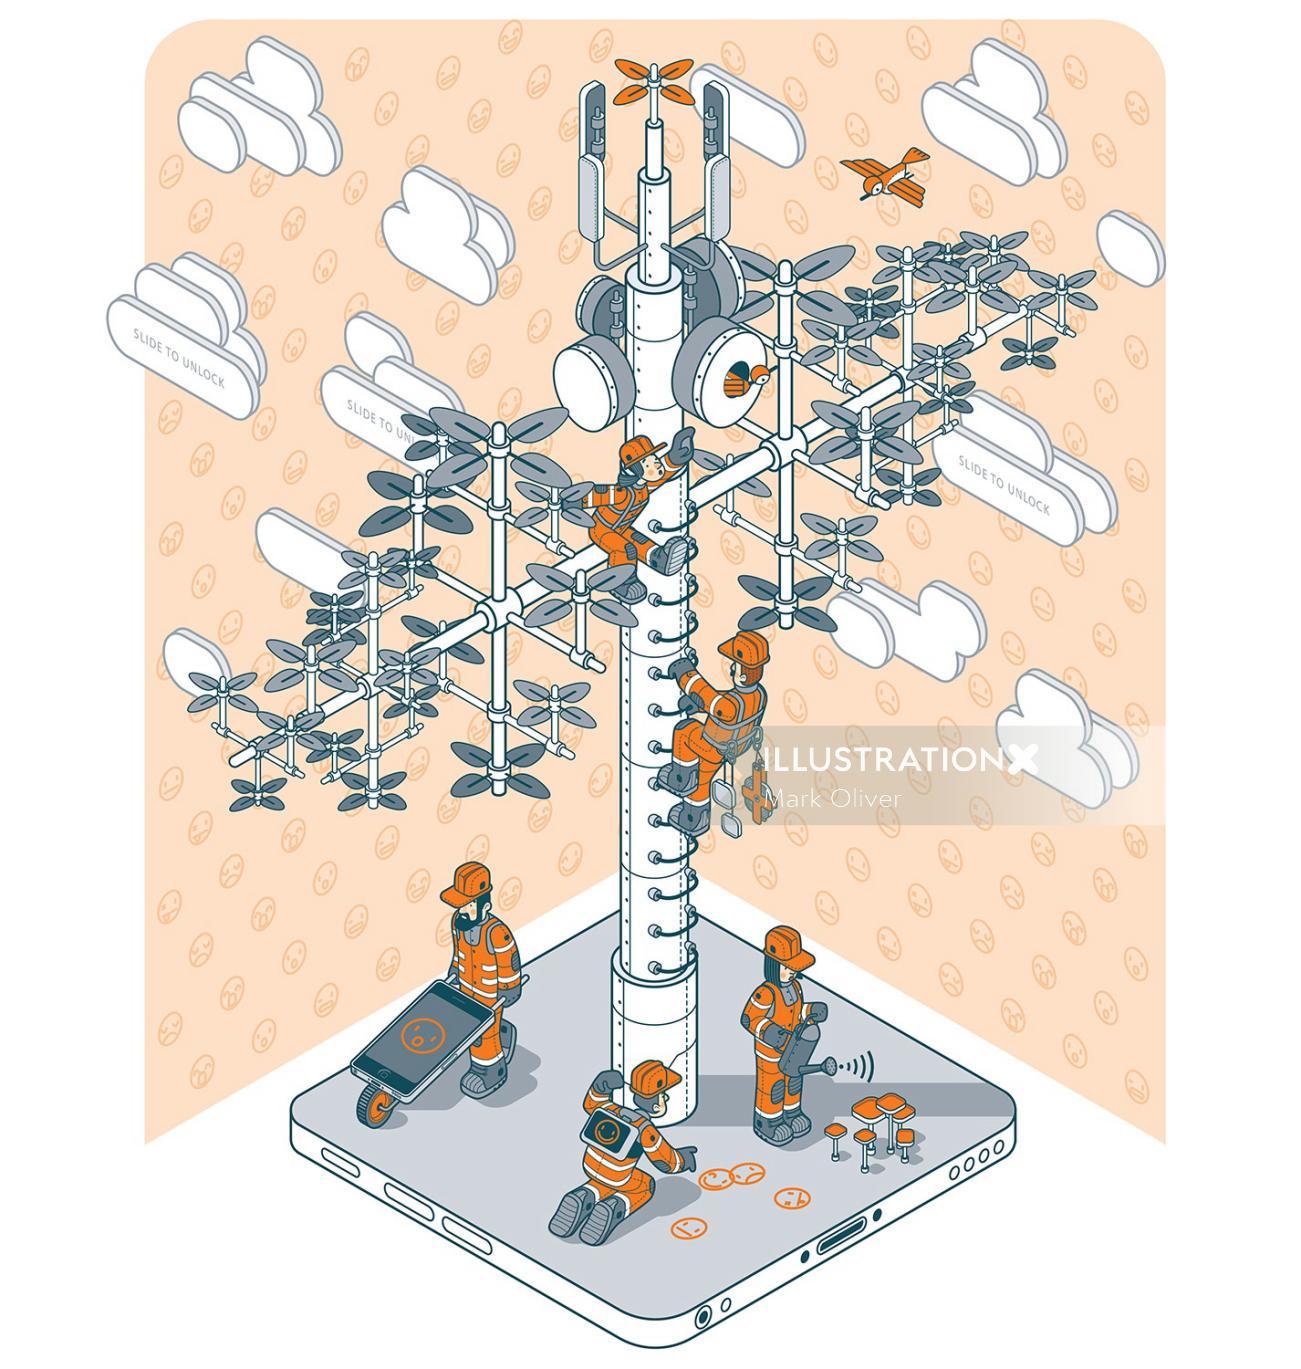 Illustration of telecom tree